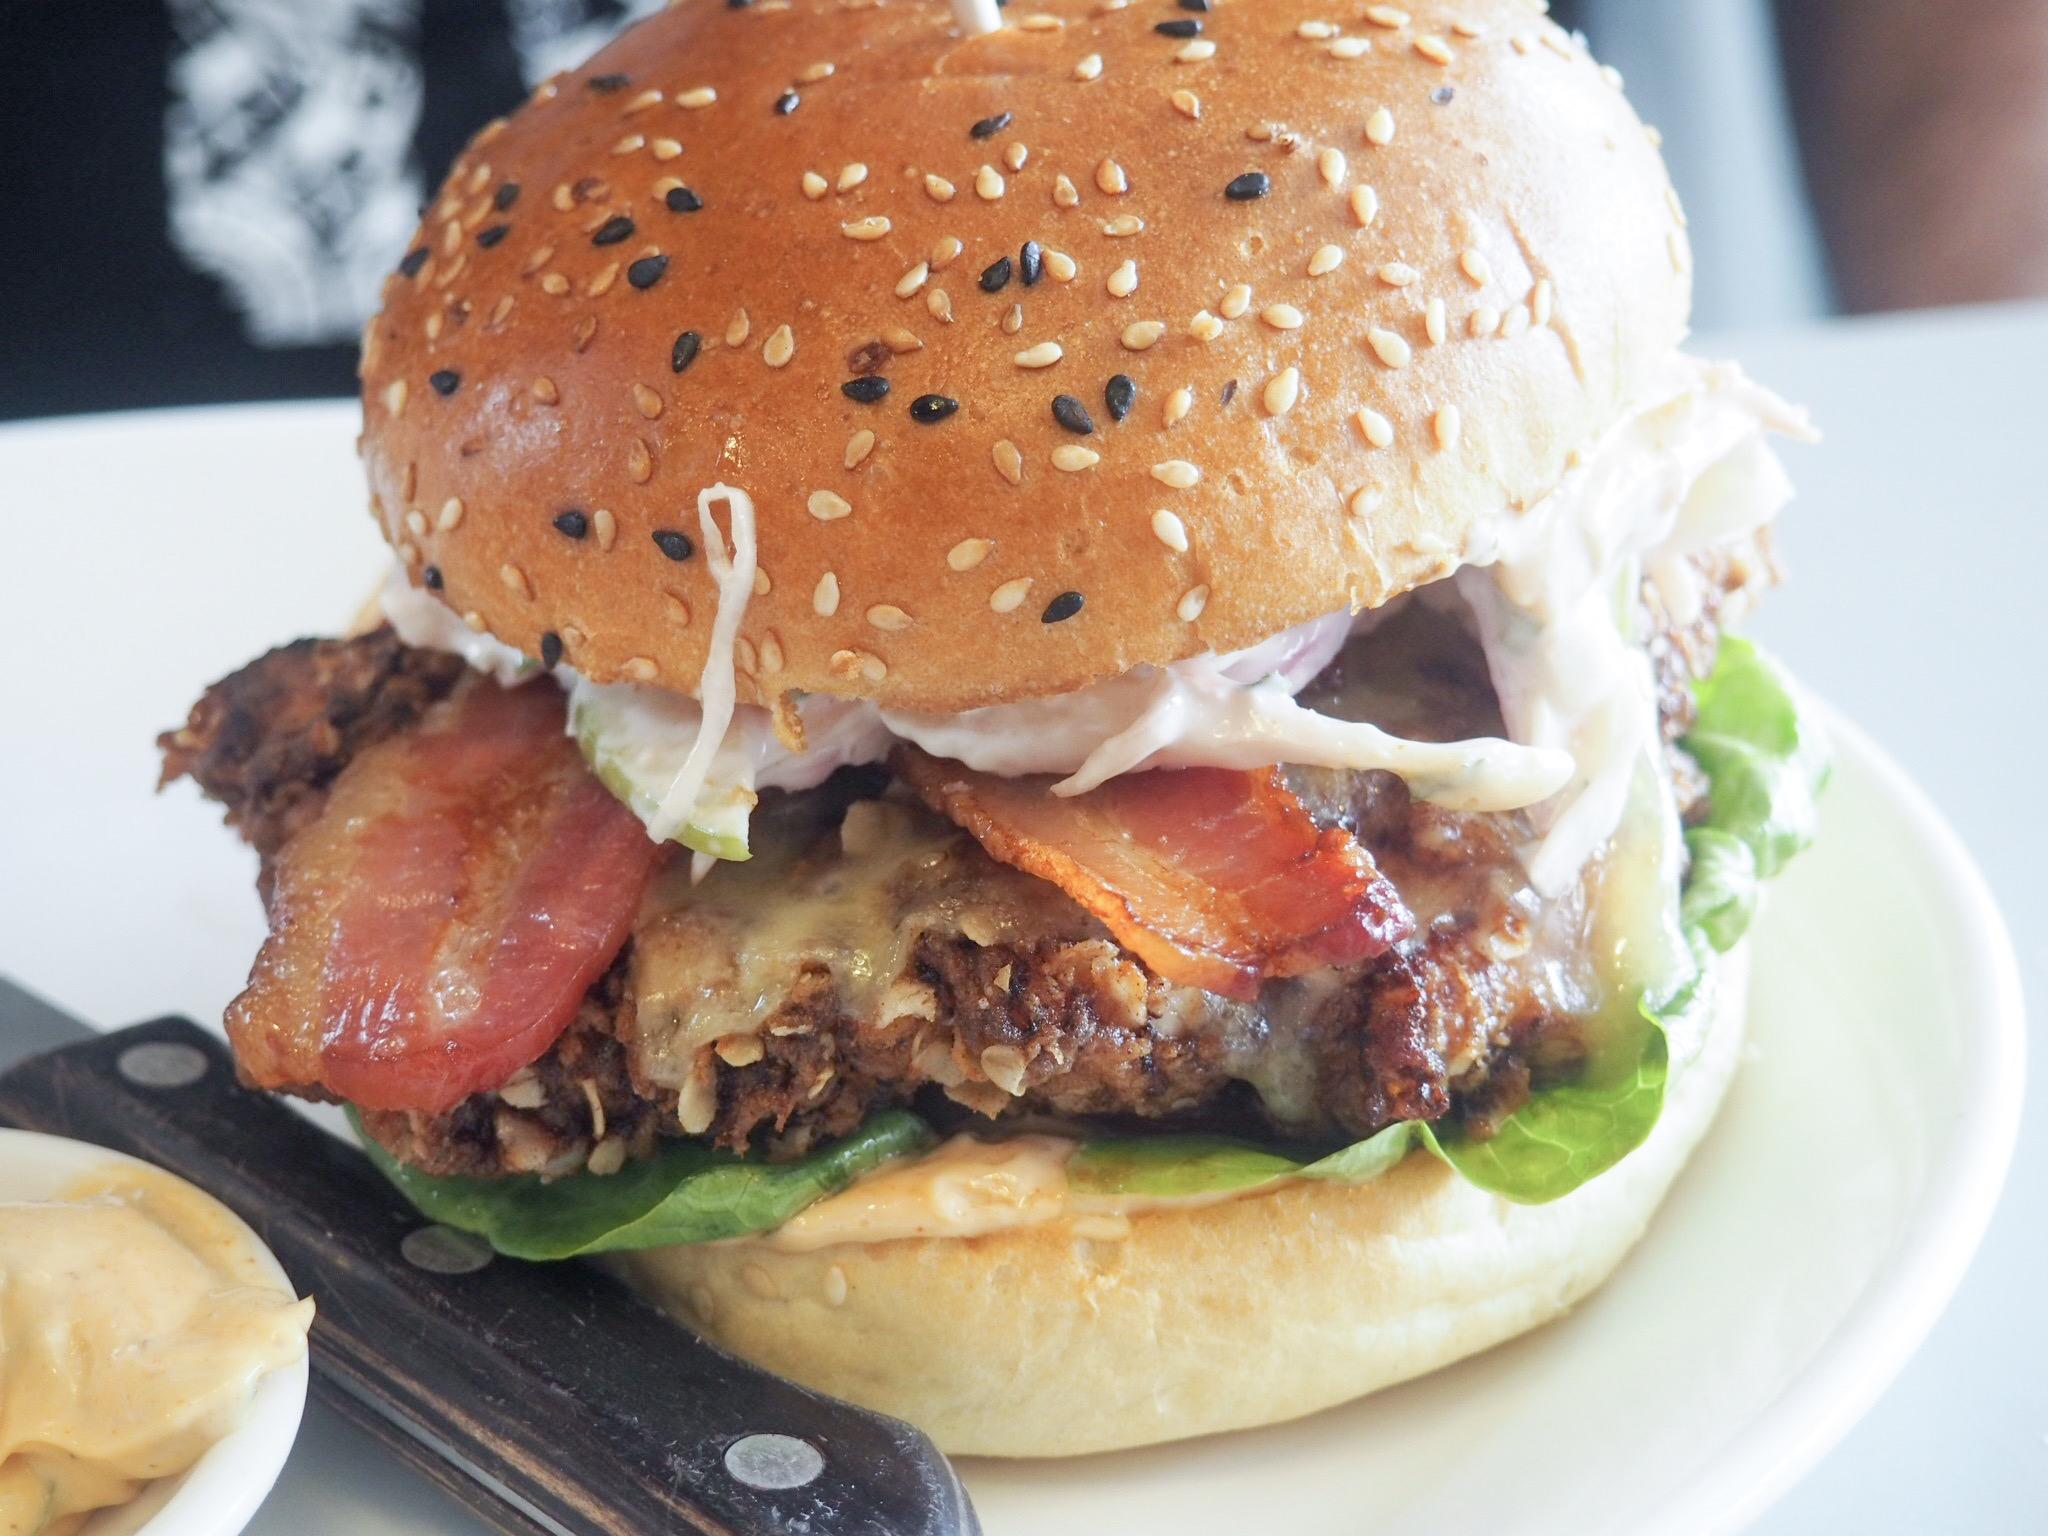 Bill's buttermilk chicken burger